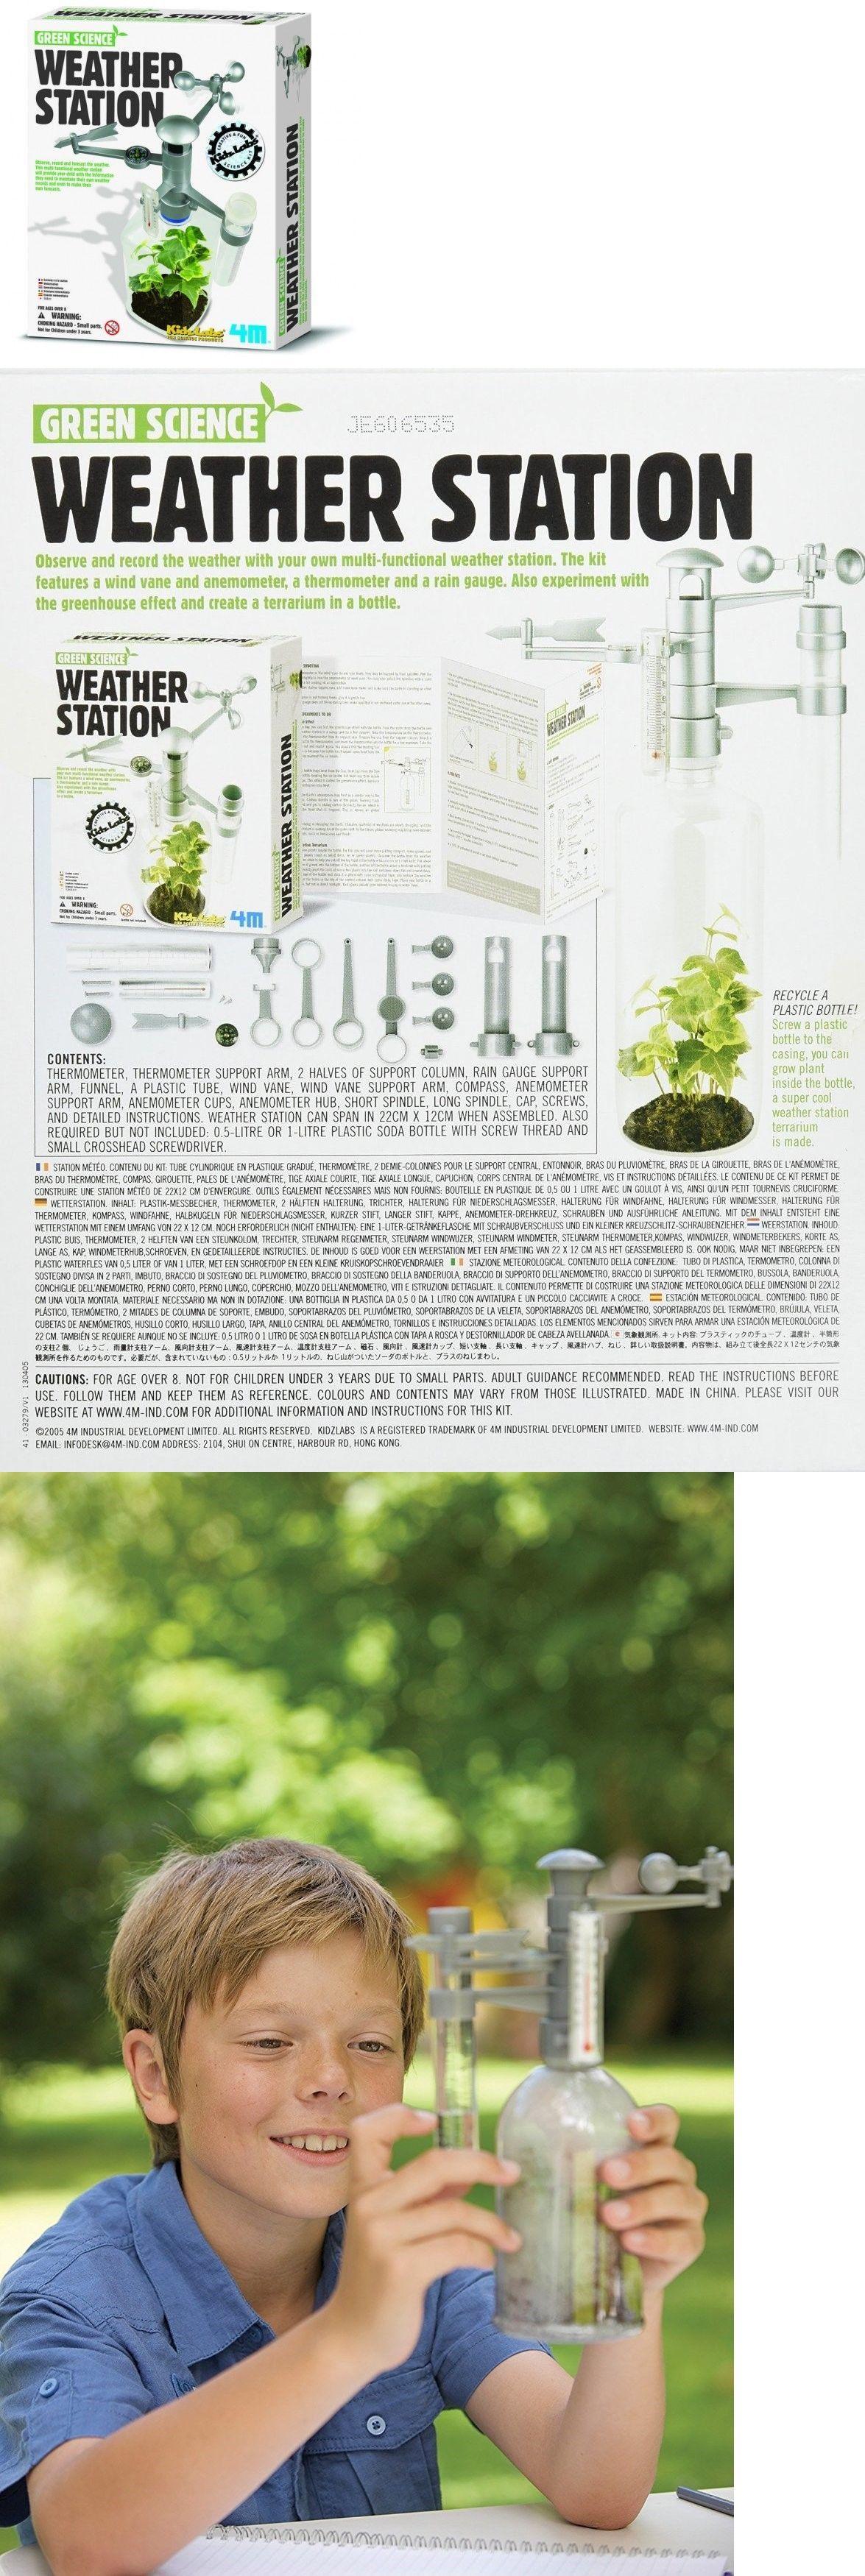 Multiple Subjects Mixed Lots Toysmith 4m Green